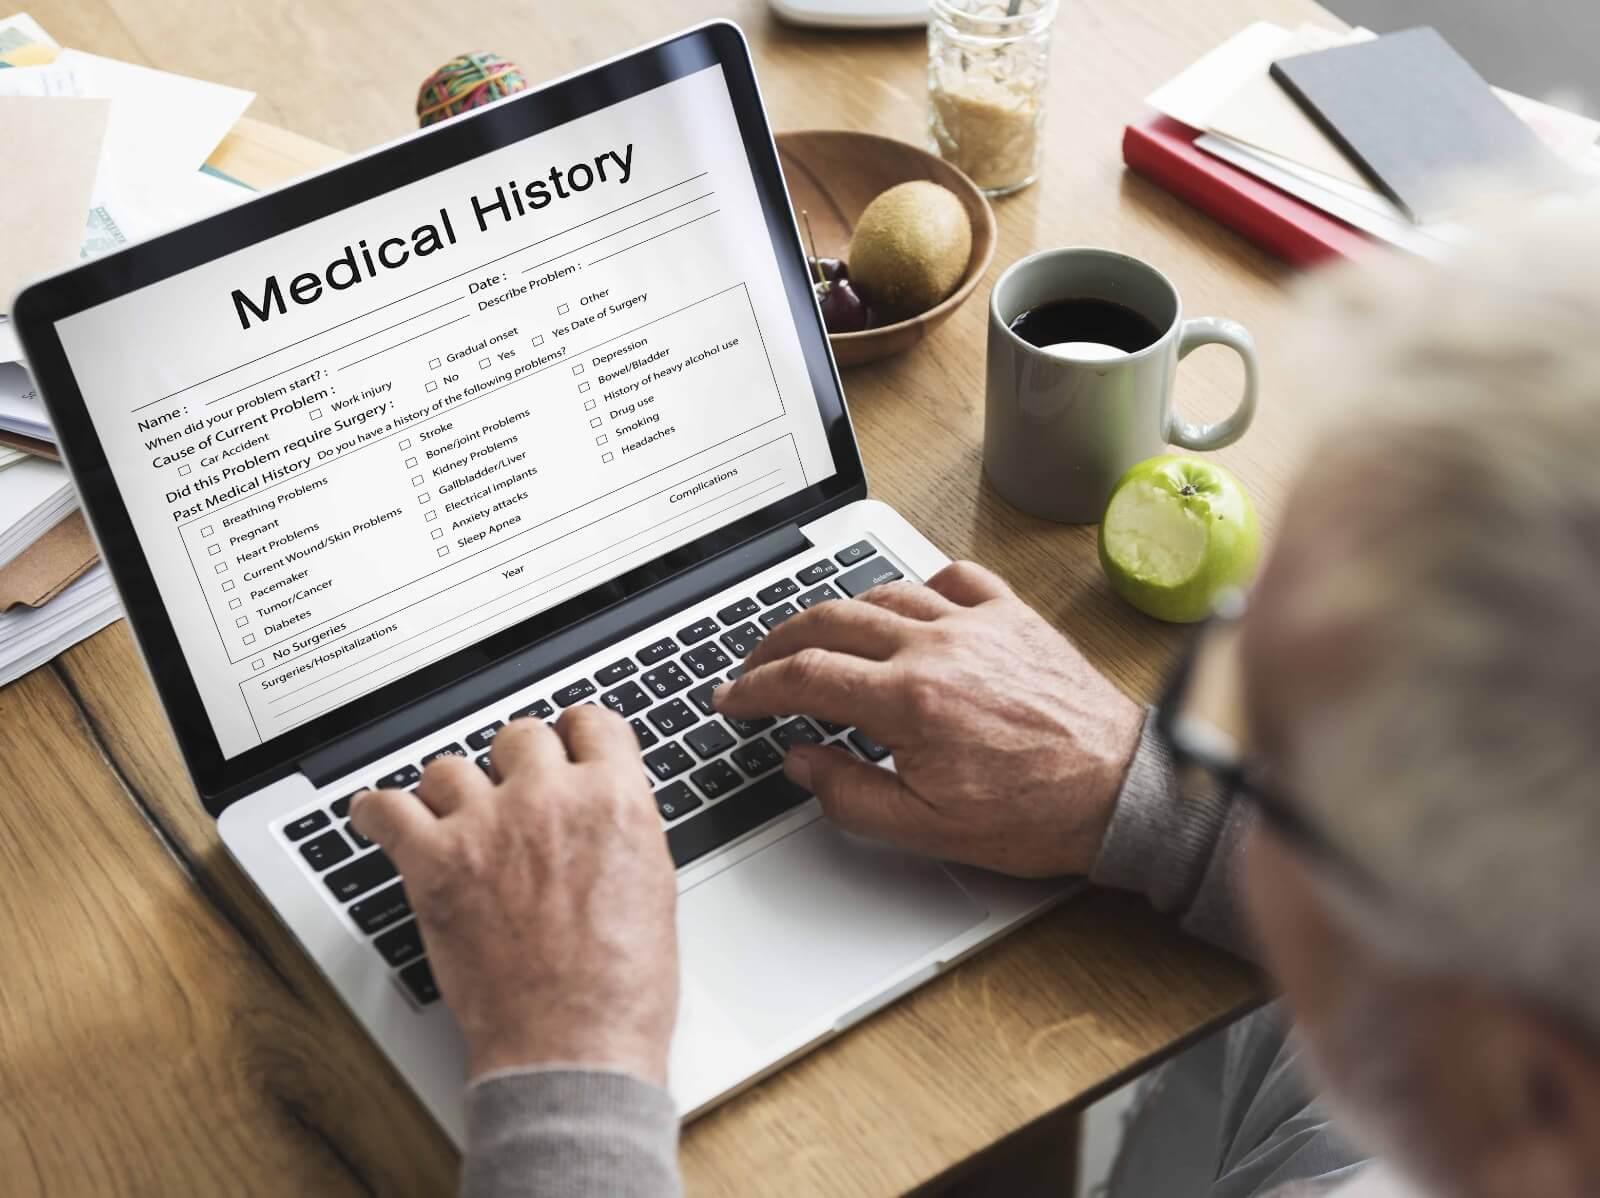 You are currently viewing תרגום מסמכים רפואיים – אילו סוגי מסמכים מצריכים תרגום, וכיצד עובד תהליך התרגום?